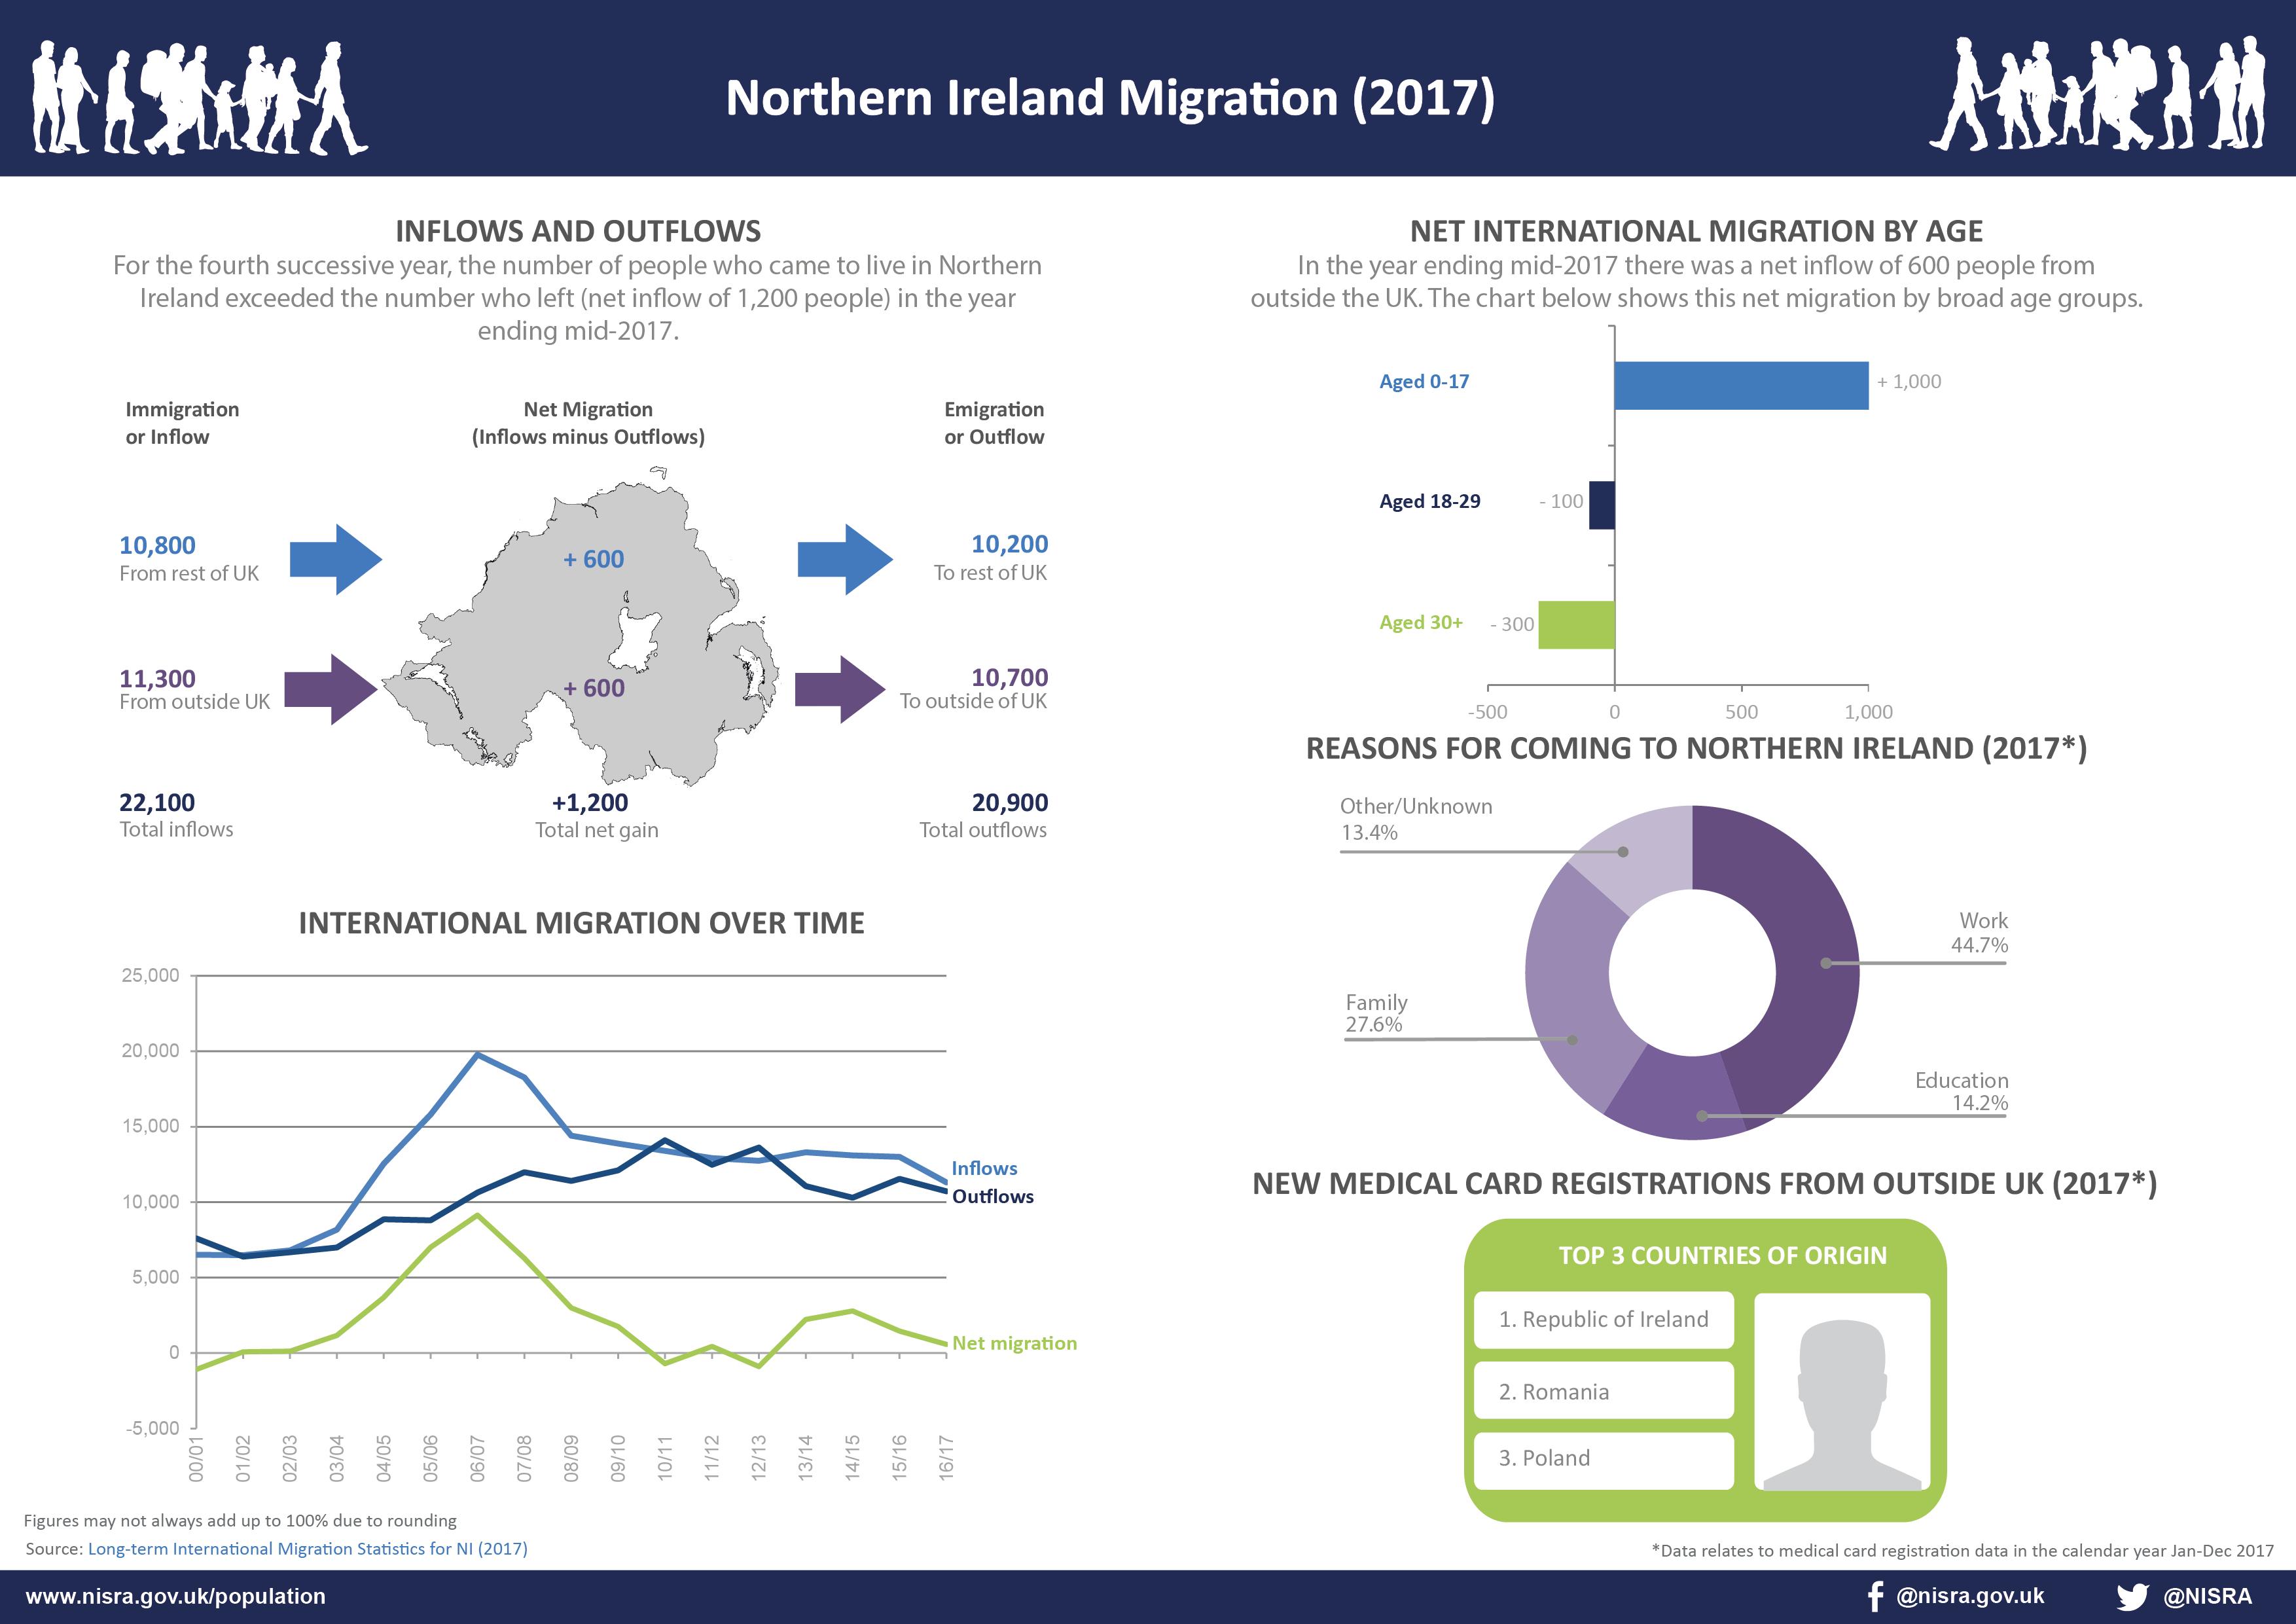 Long-term International Migration Statistics for Northern